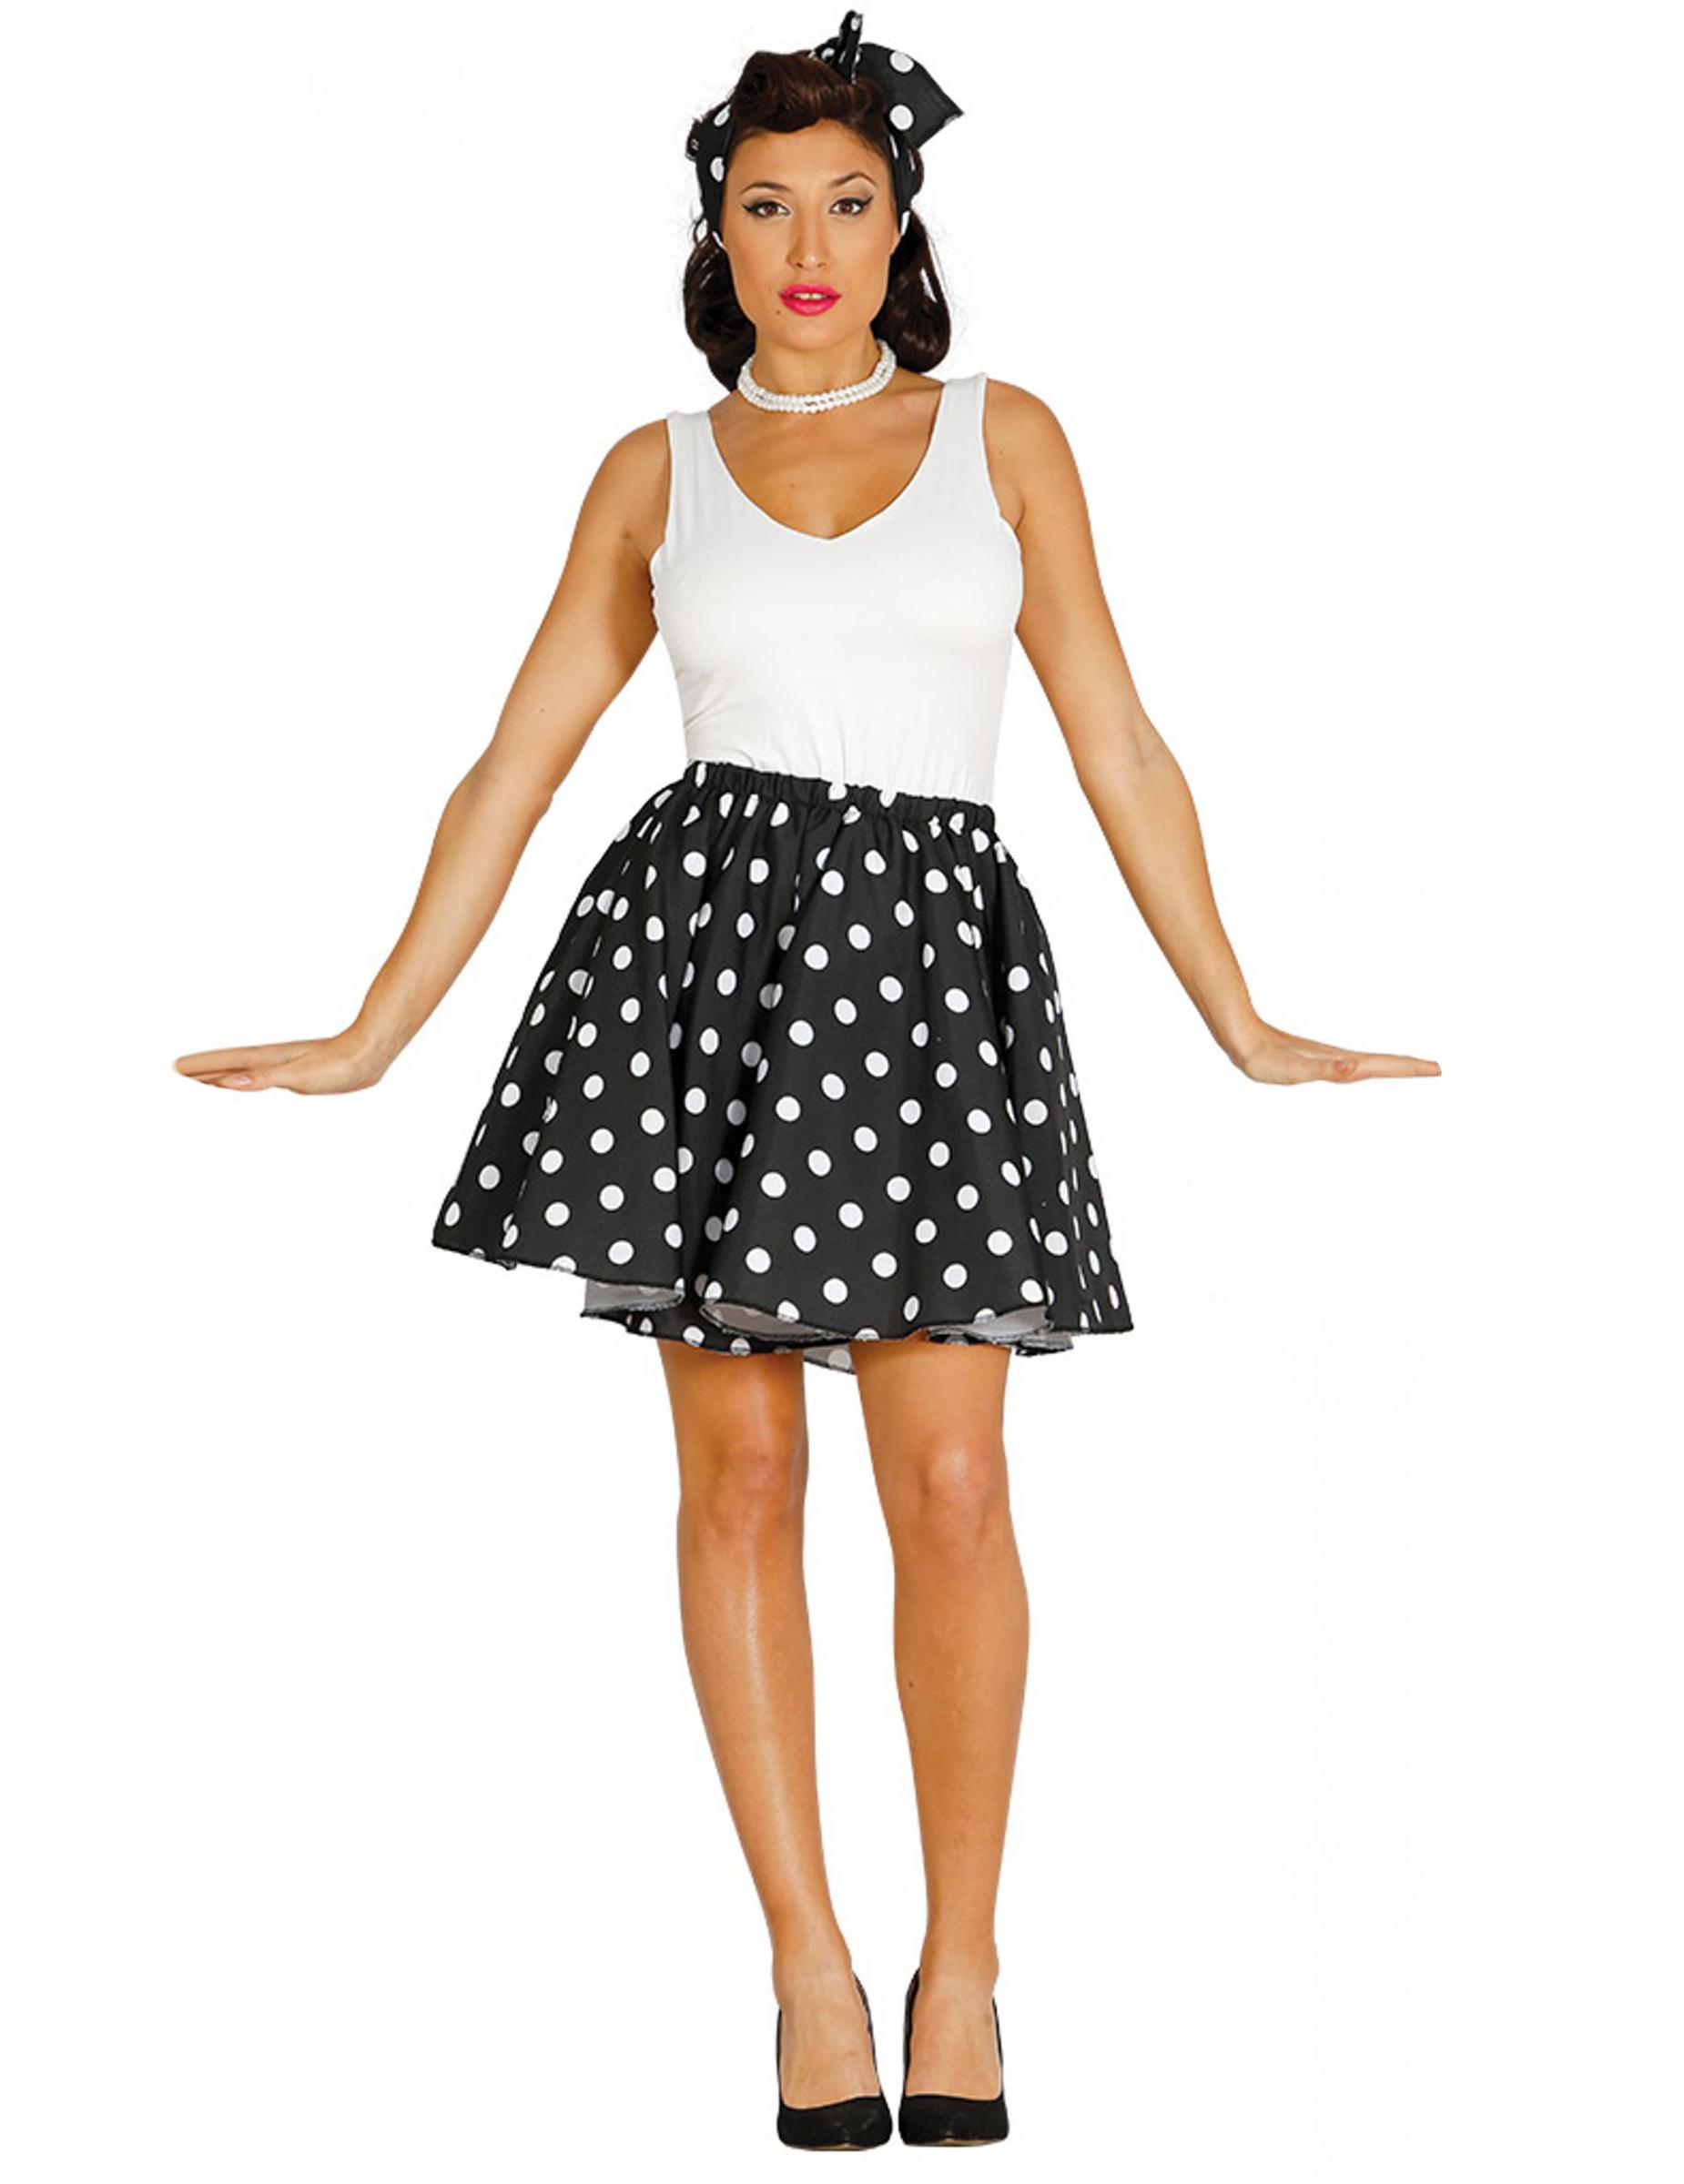 jupe et foulard noirs pois ann es 50 femme deguise toi. Black Bedroom Furniture Sets. Home Design Ideas